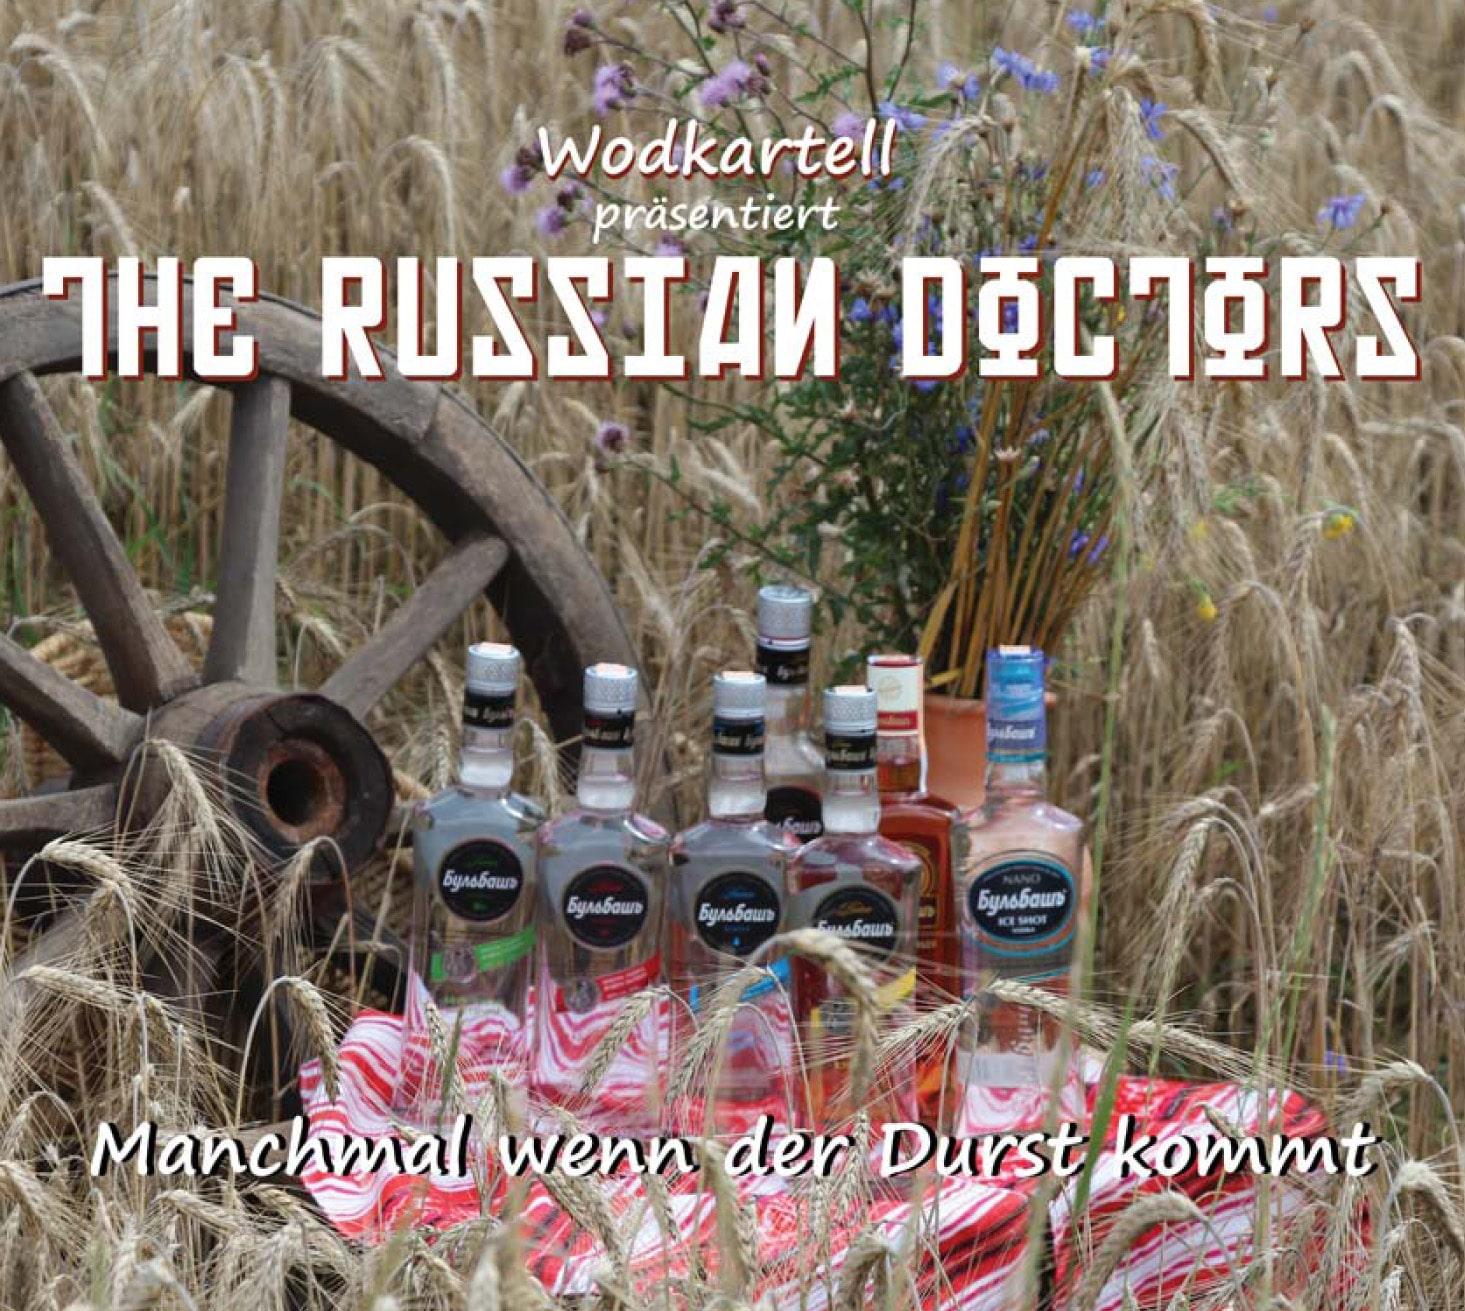 The Russian Doctors -Manchmal wenn der Durst kommt - CD